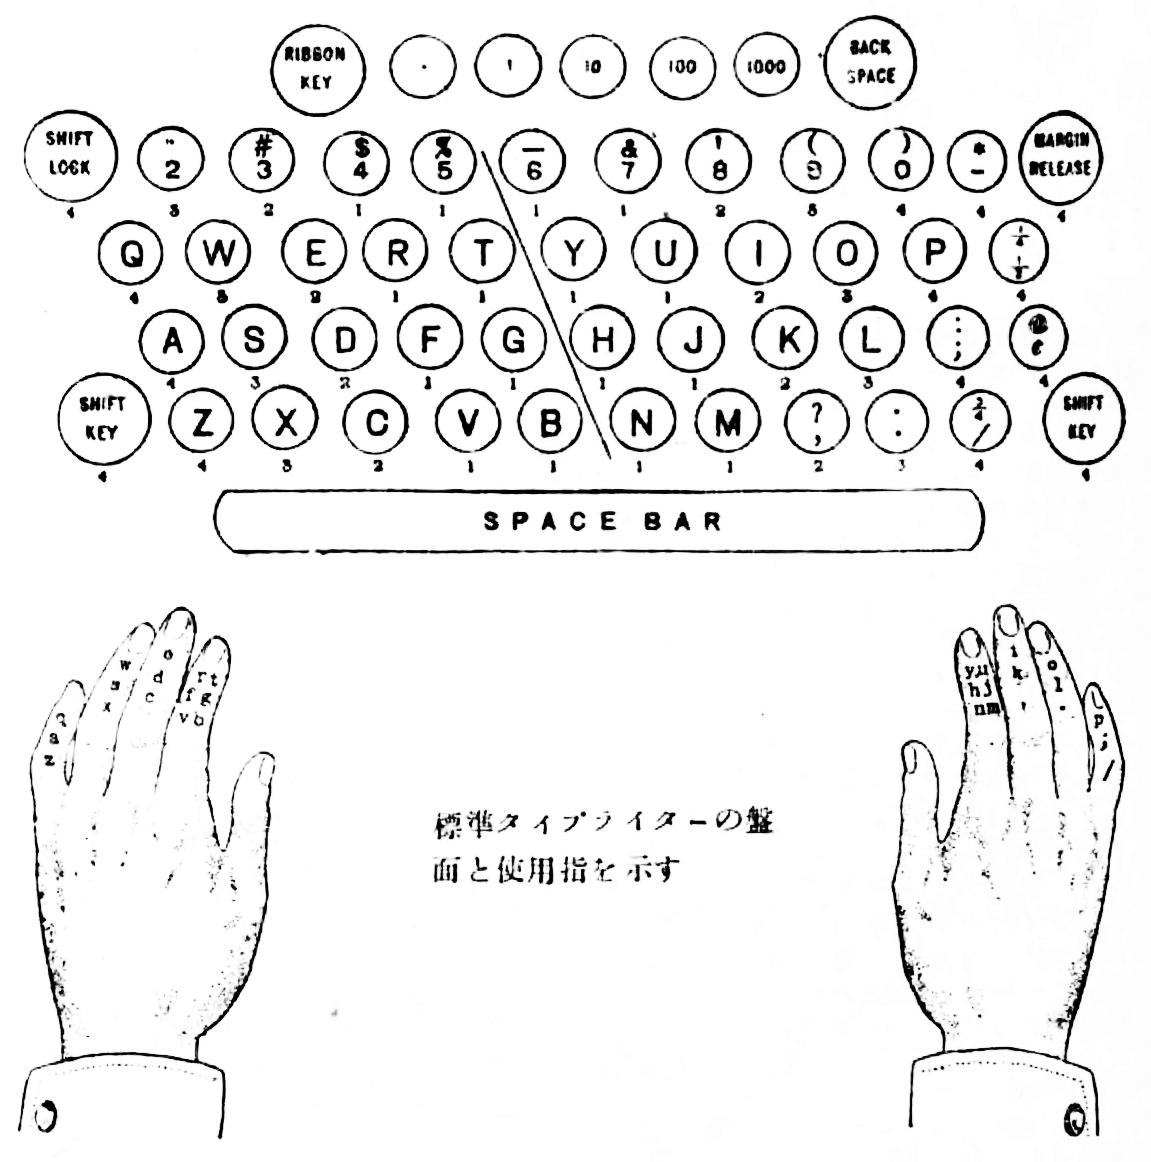 Keys of typewriter for fingers.png